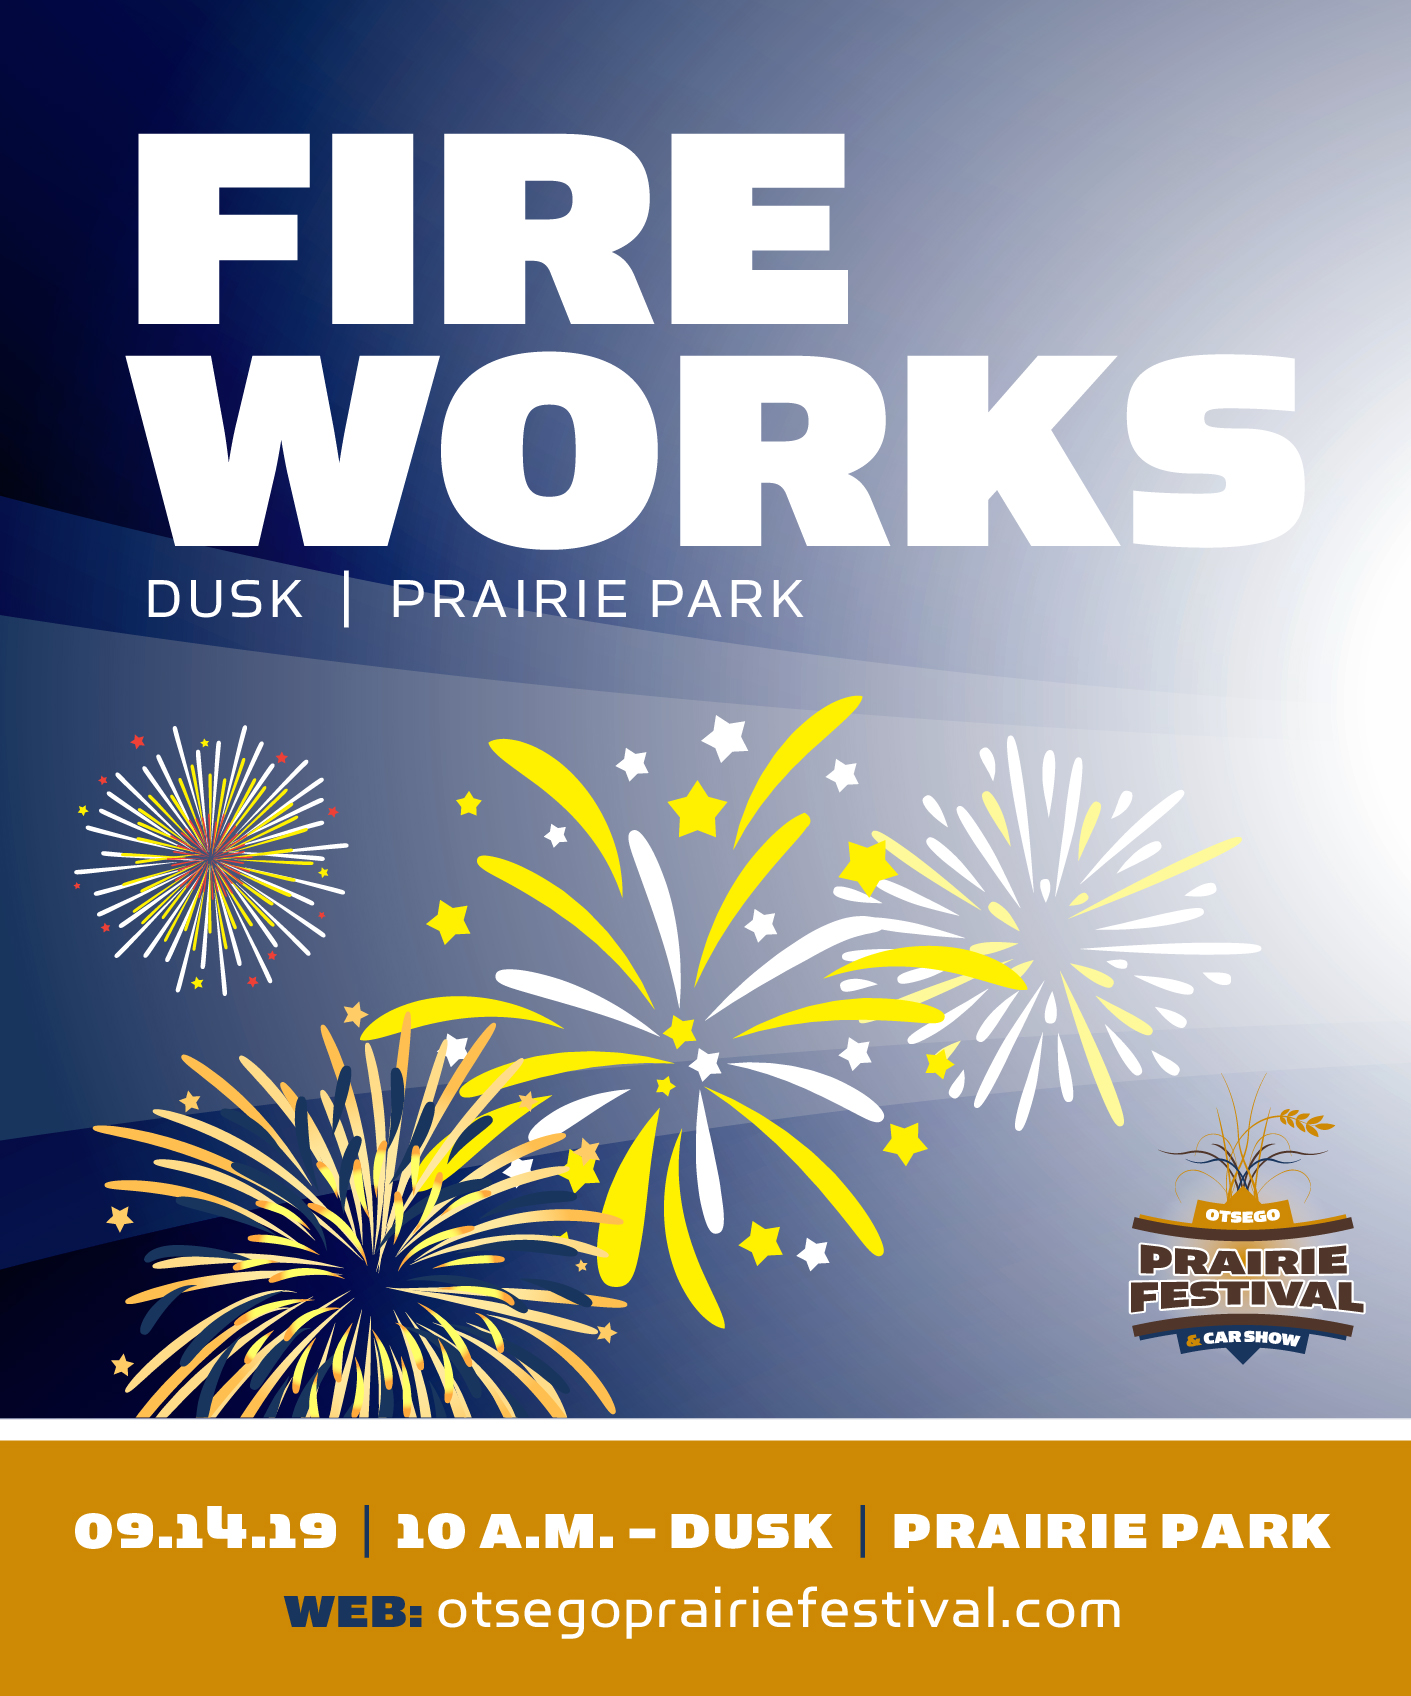 FB_Fireworks_2019